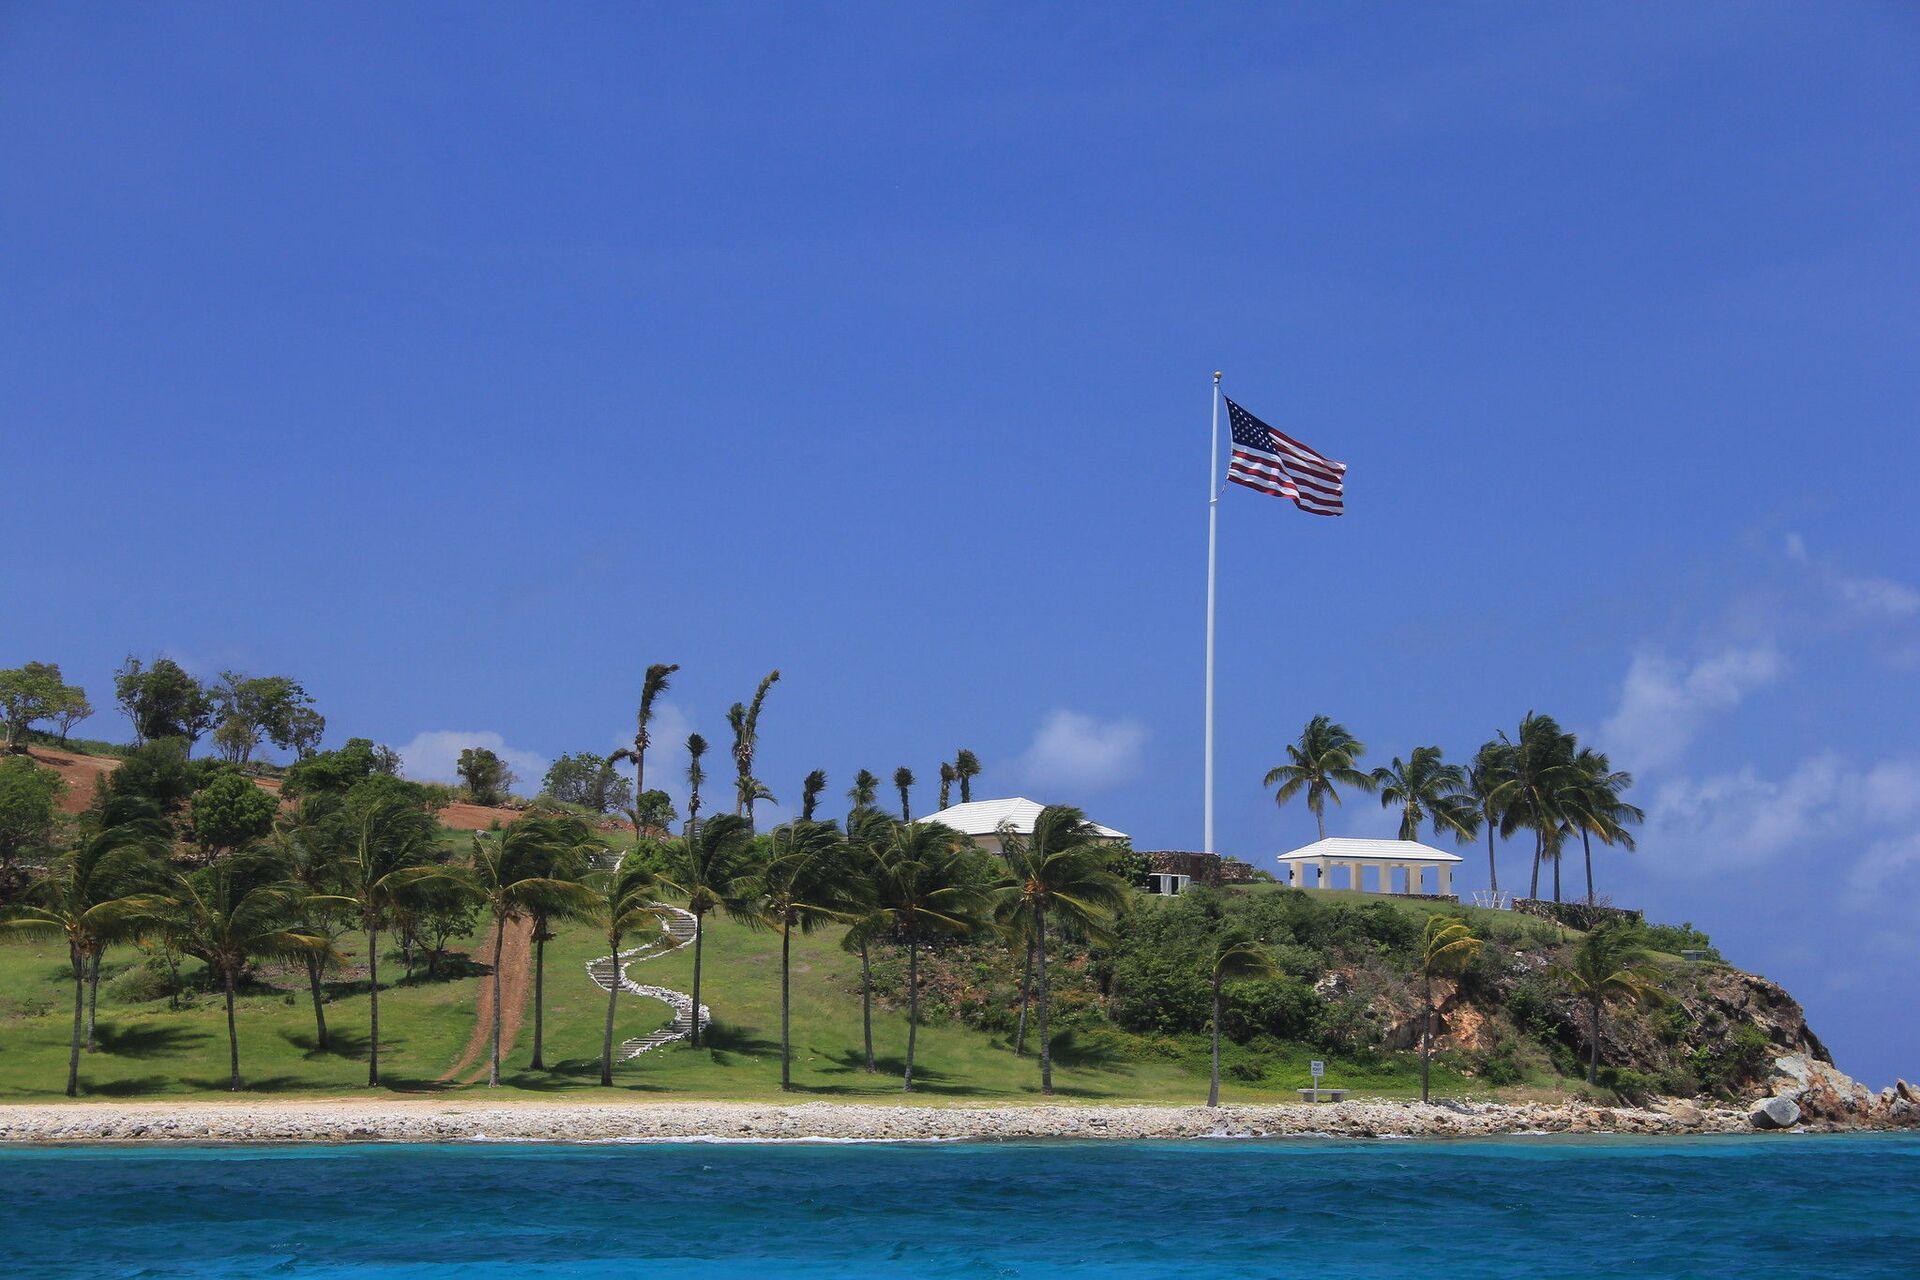 Jeffrey Epstein's private Little St. James island in US Virgin Islands - Sputnik International, 1920, 07.09.2021